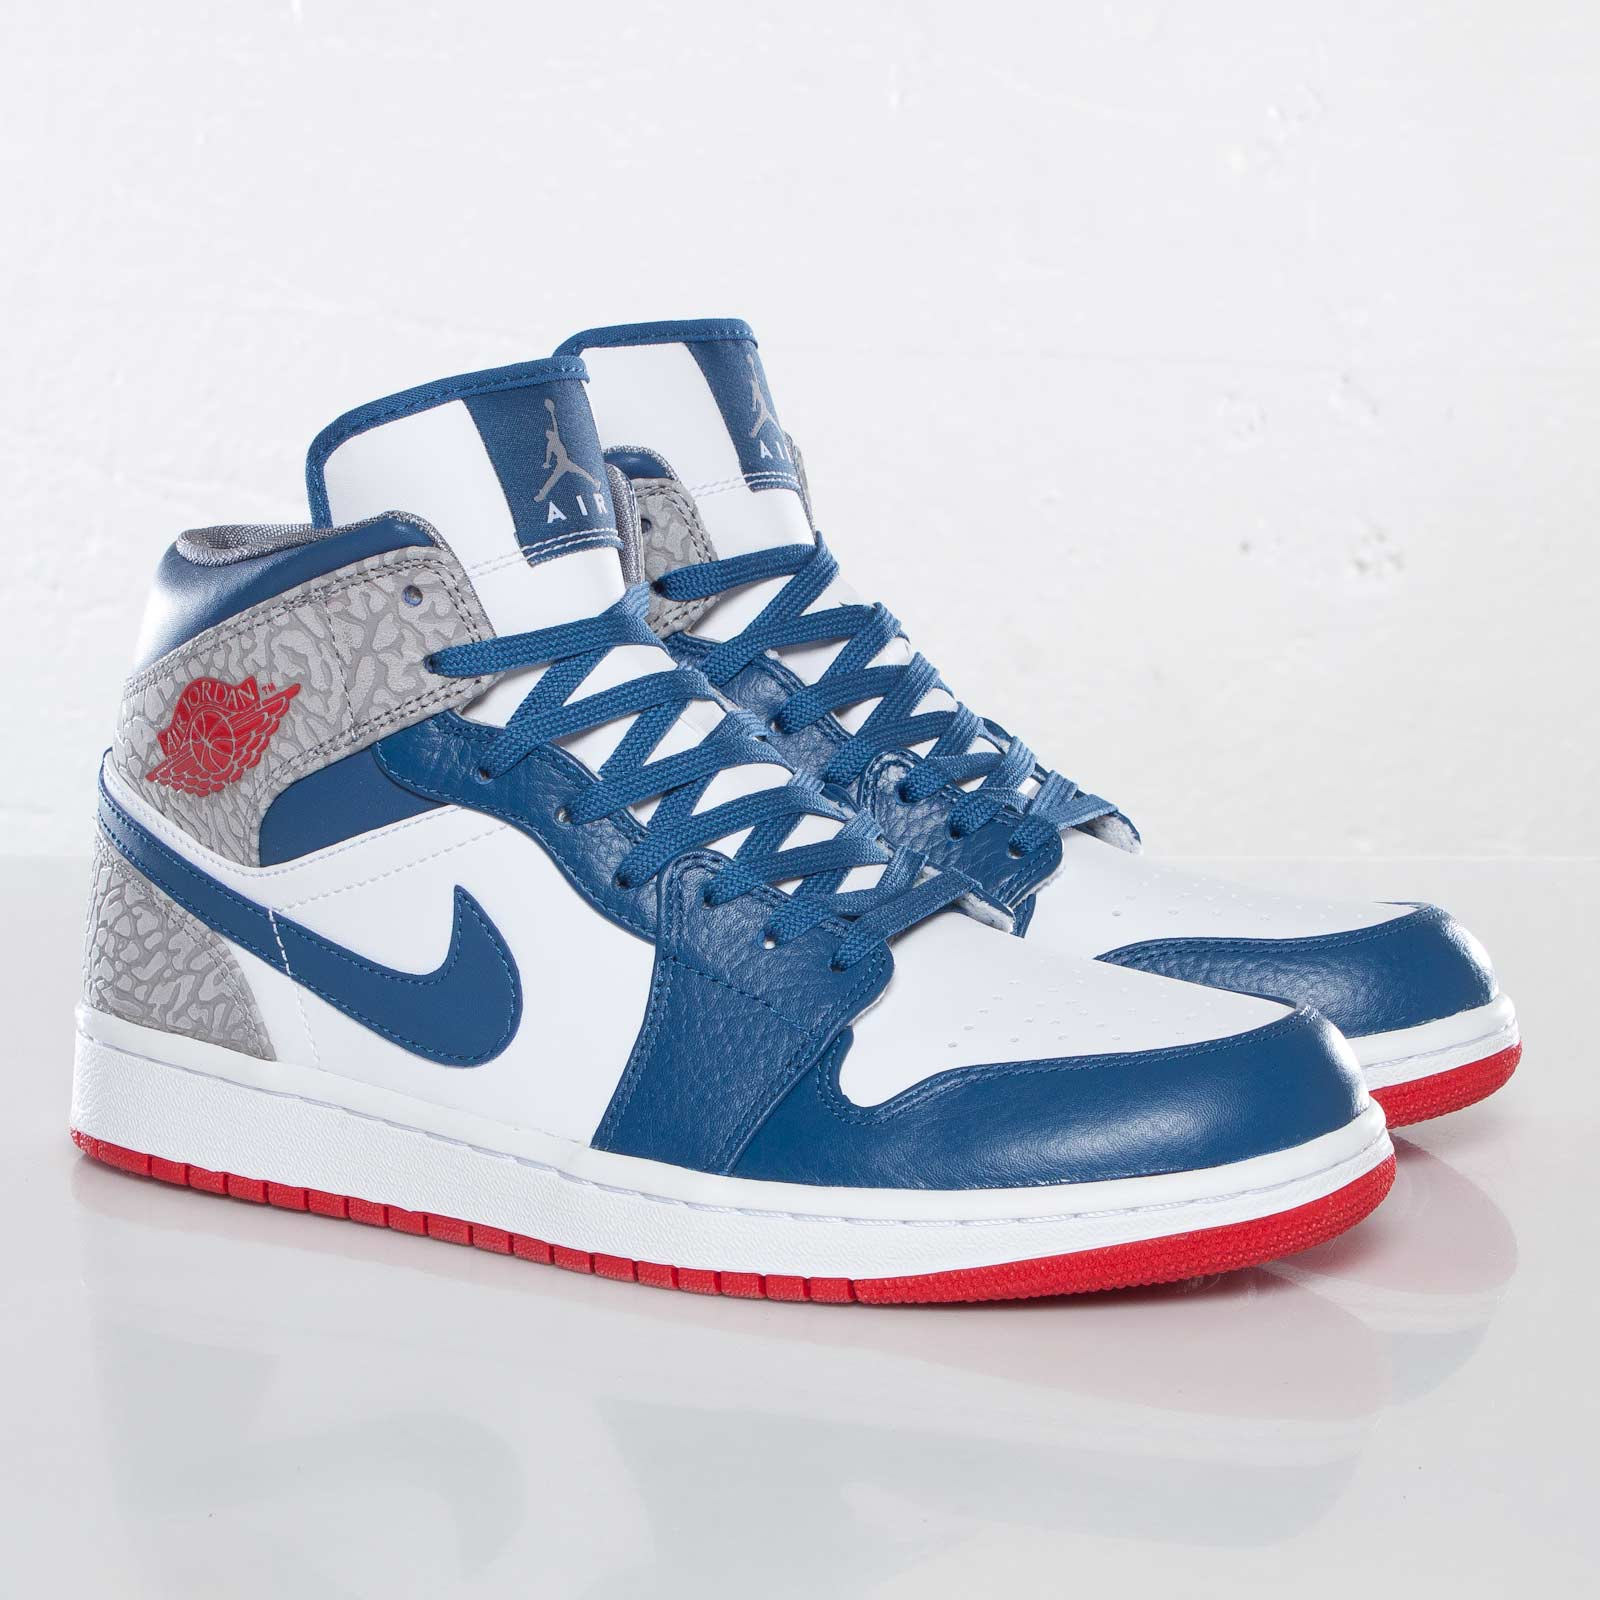 5e4c90197b82 Jordan Brand Air Jordan 1 Mid - 554724-107 - Sneakersnstuff ...